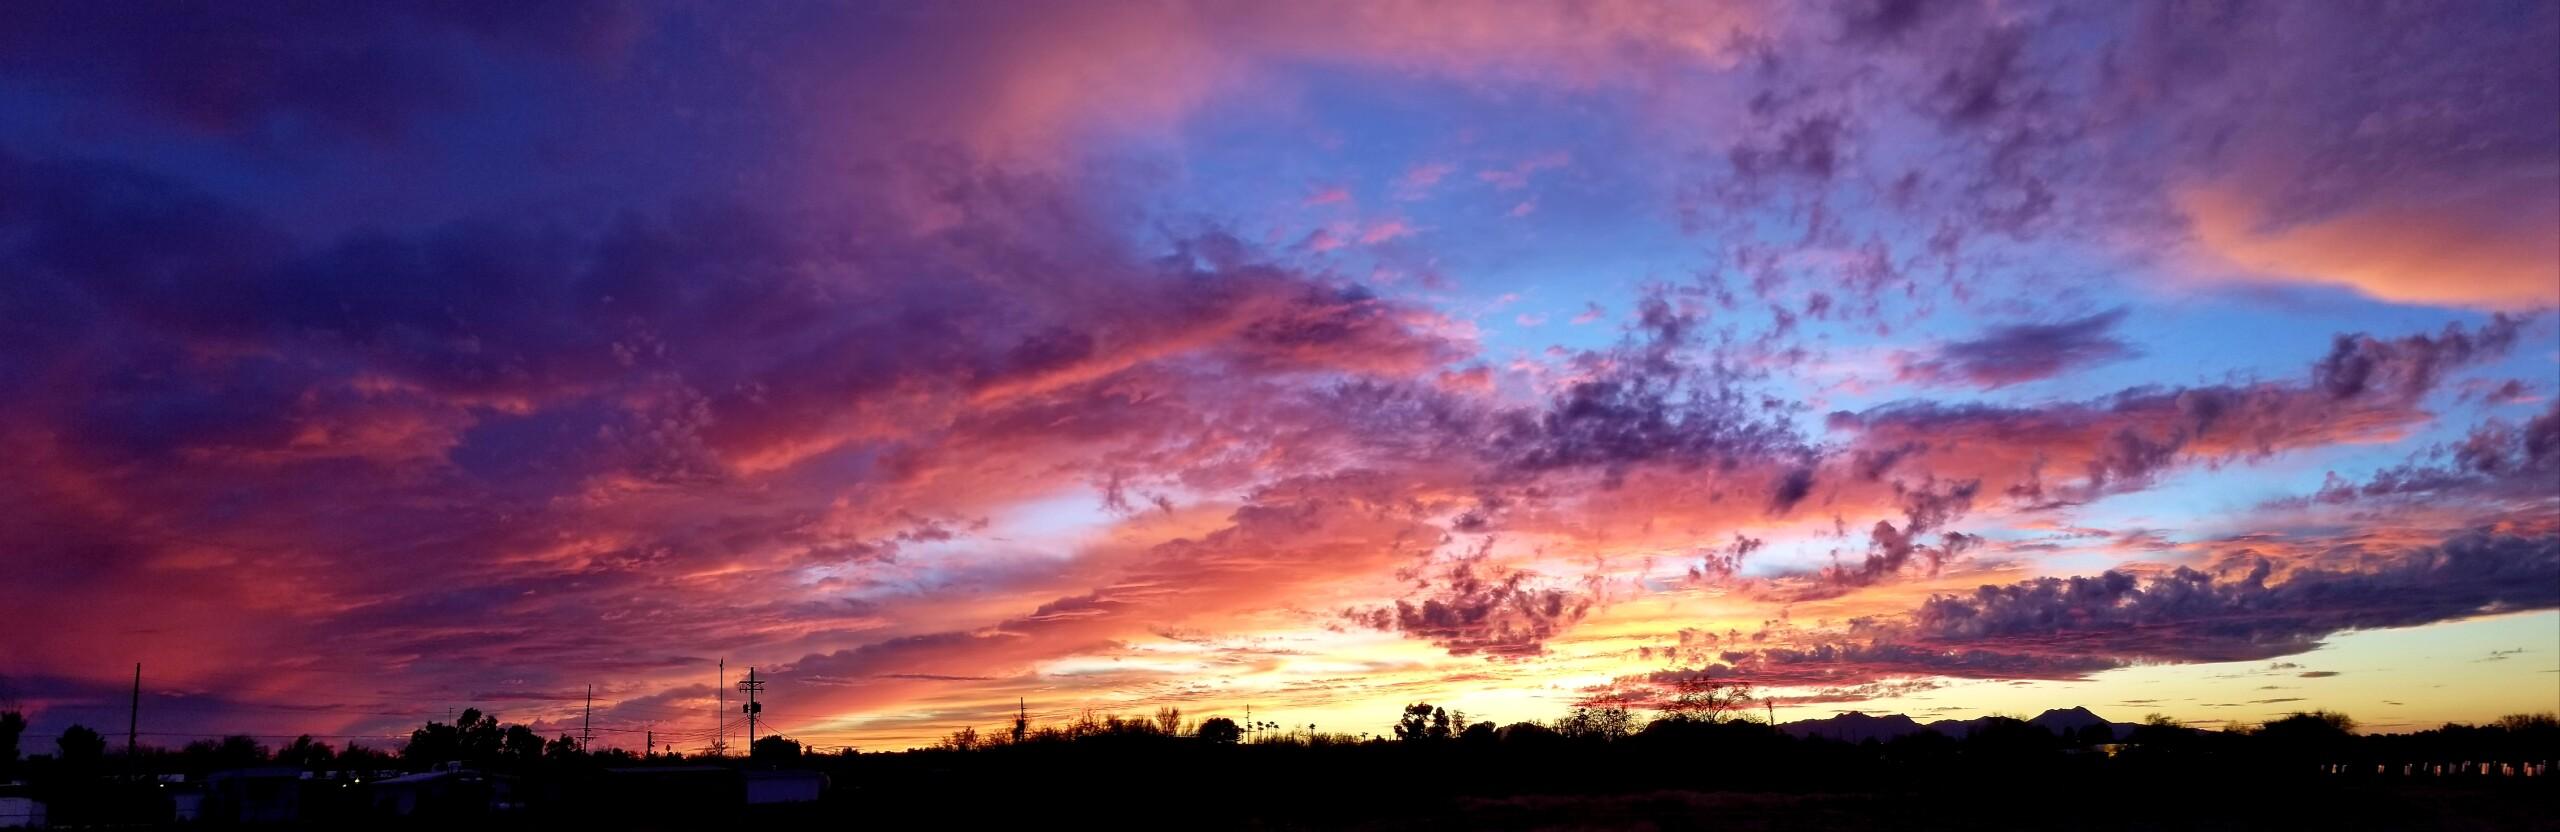 UA Tucson Sunset Jan 10 Wyatt C. Morgan.jpg